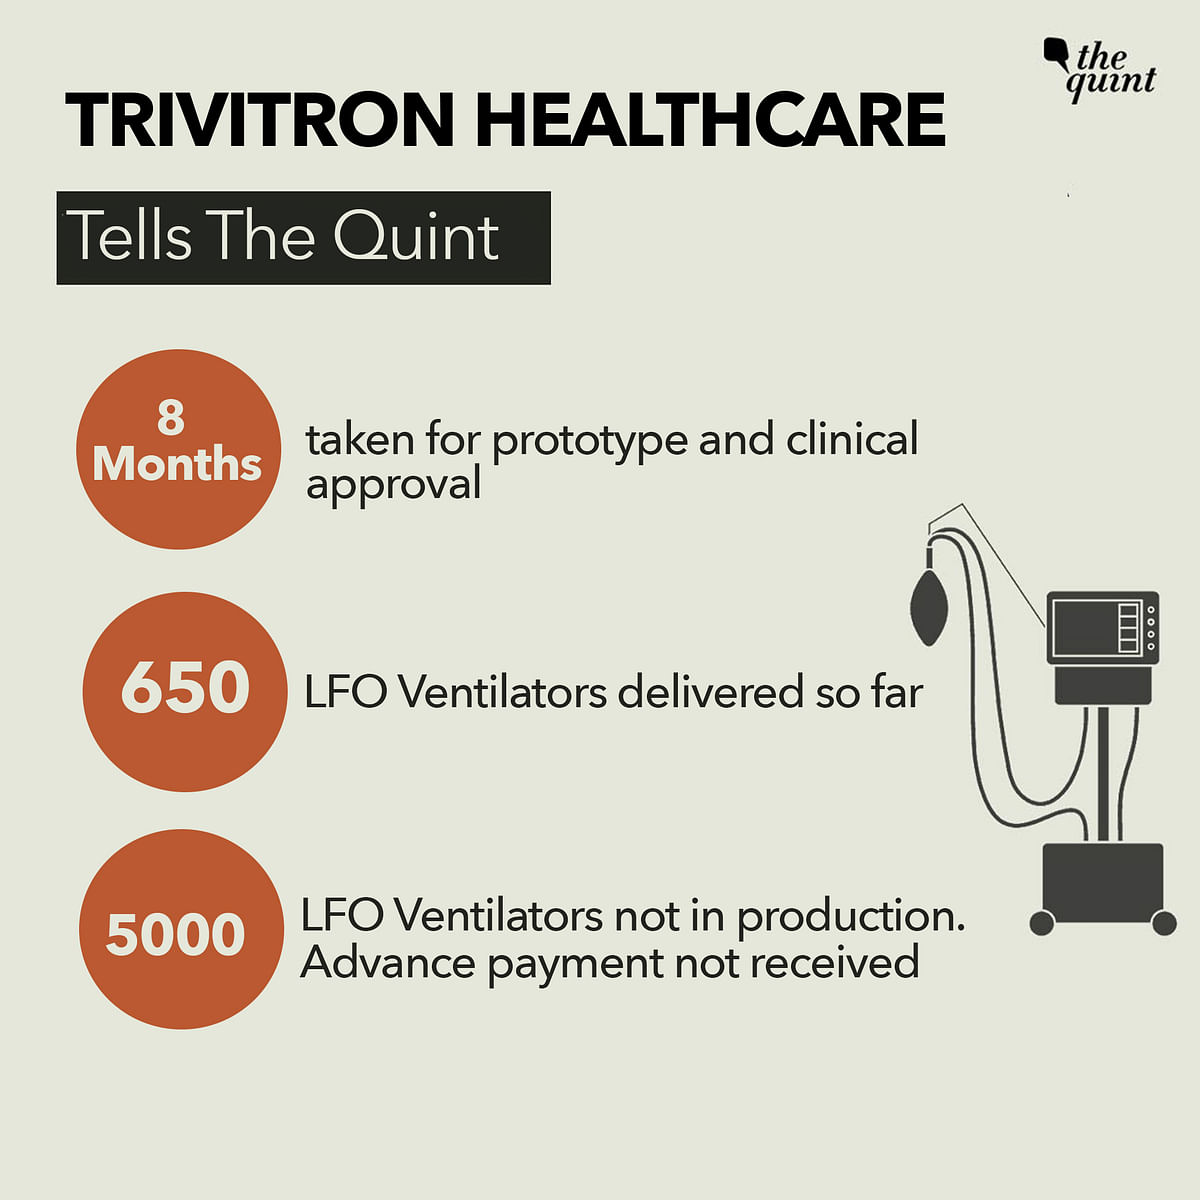 No Payment, Lives Lost: 6,300 'PM CARES' Ventilators Not Delivered